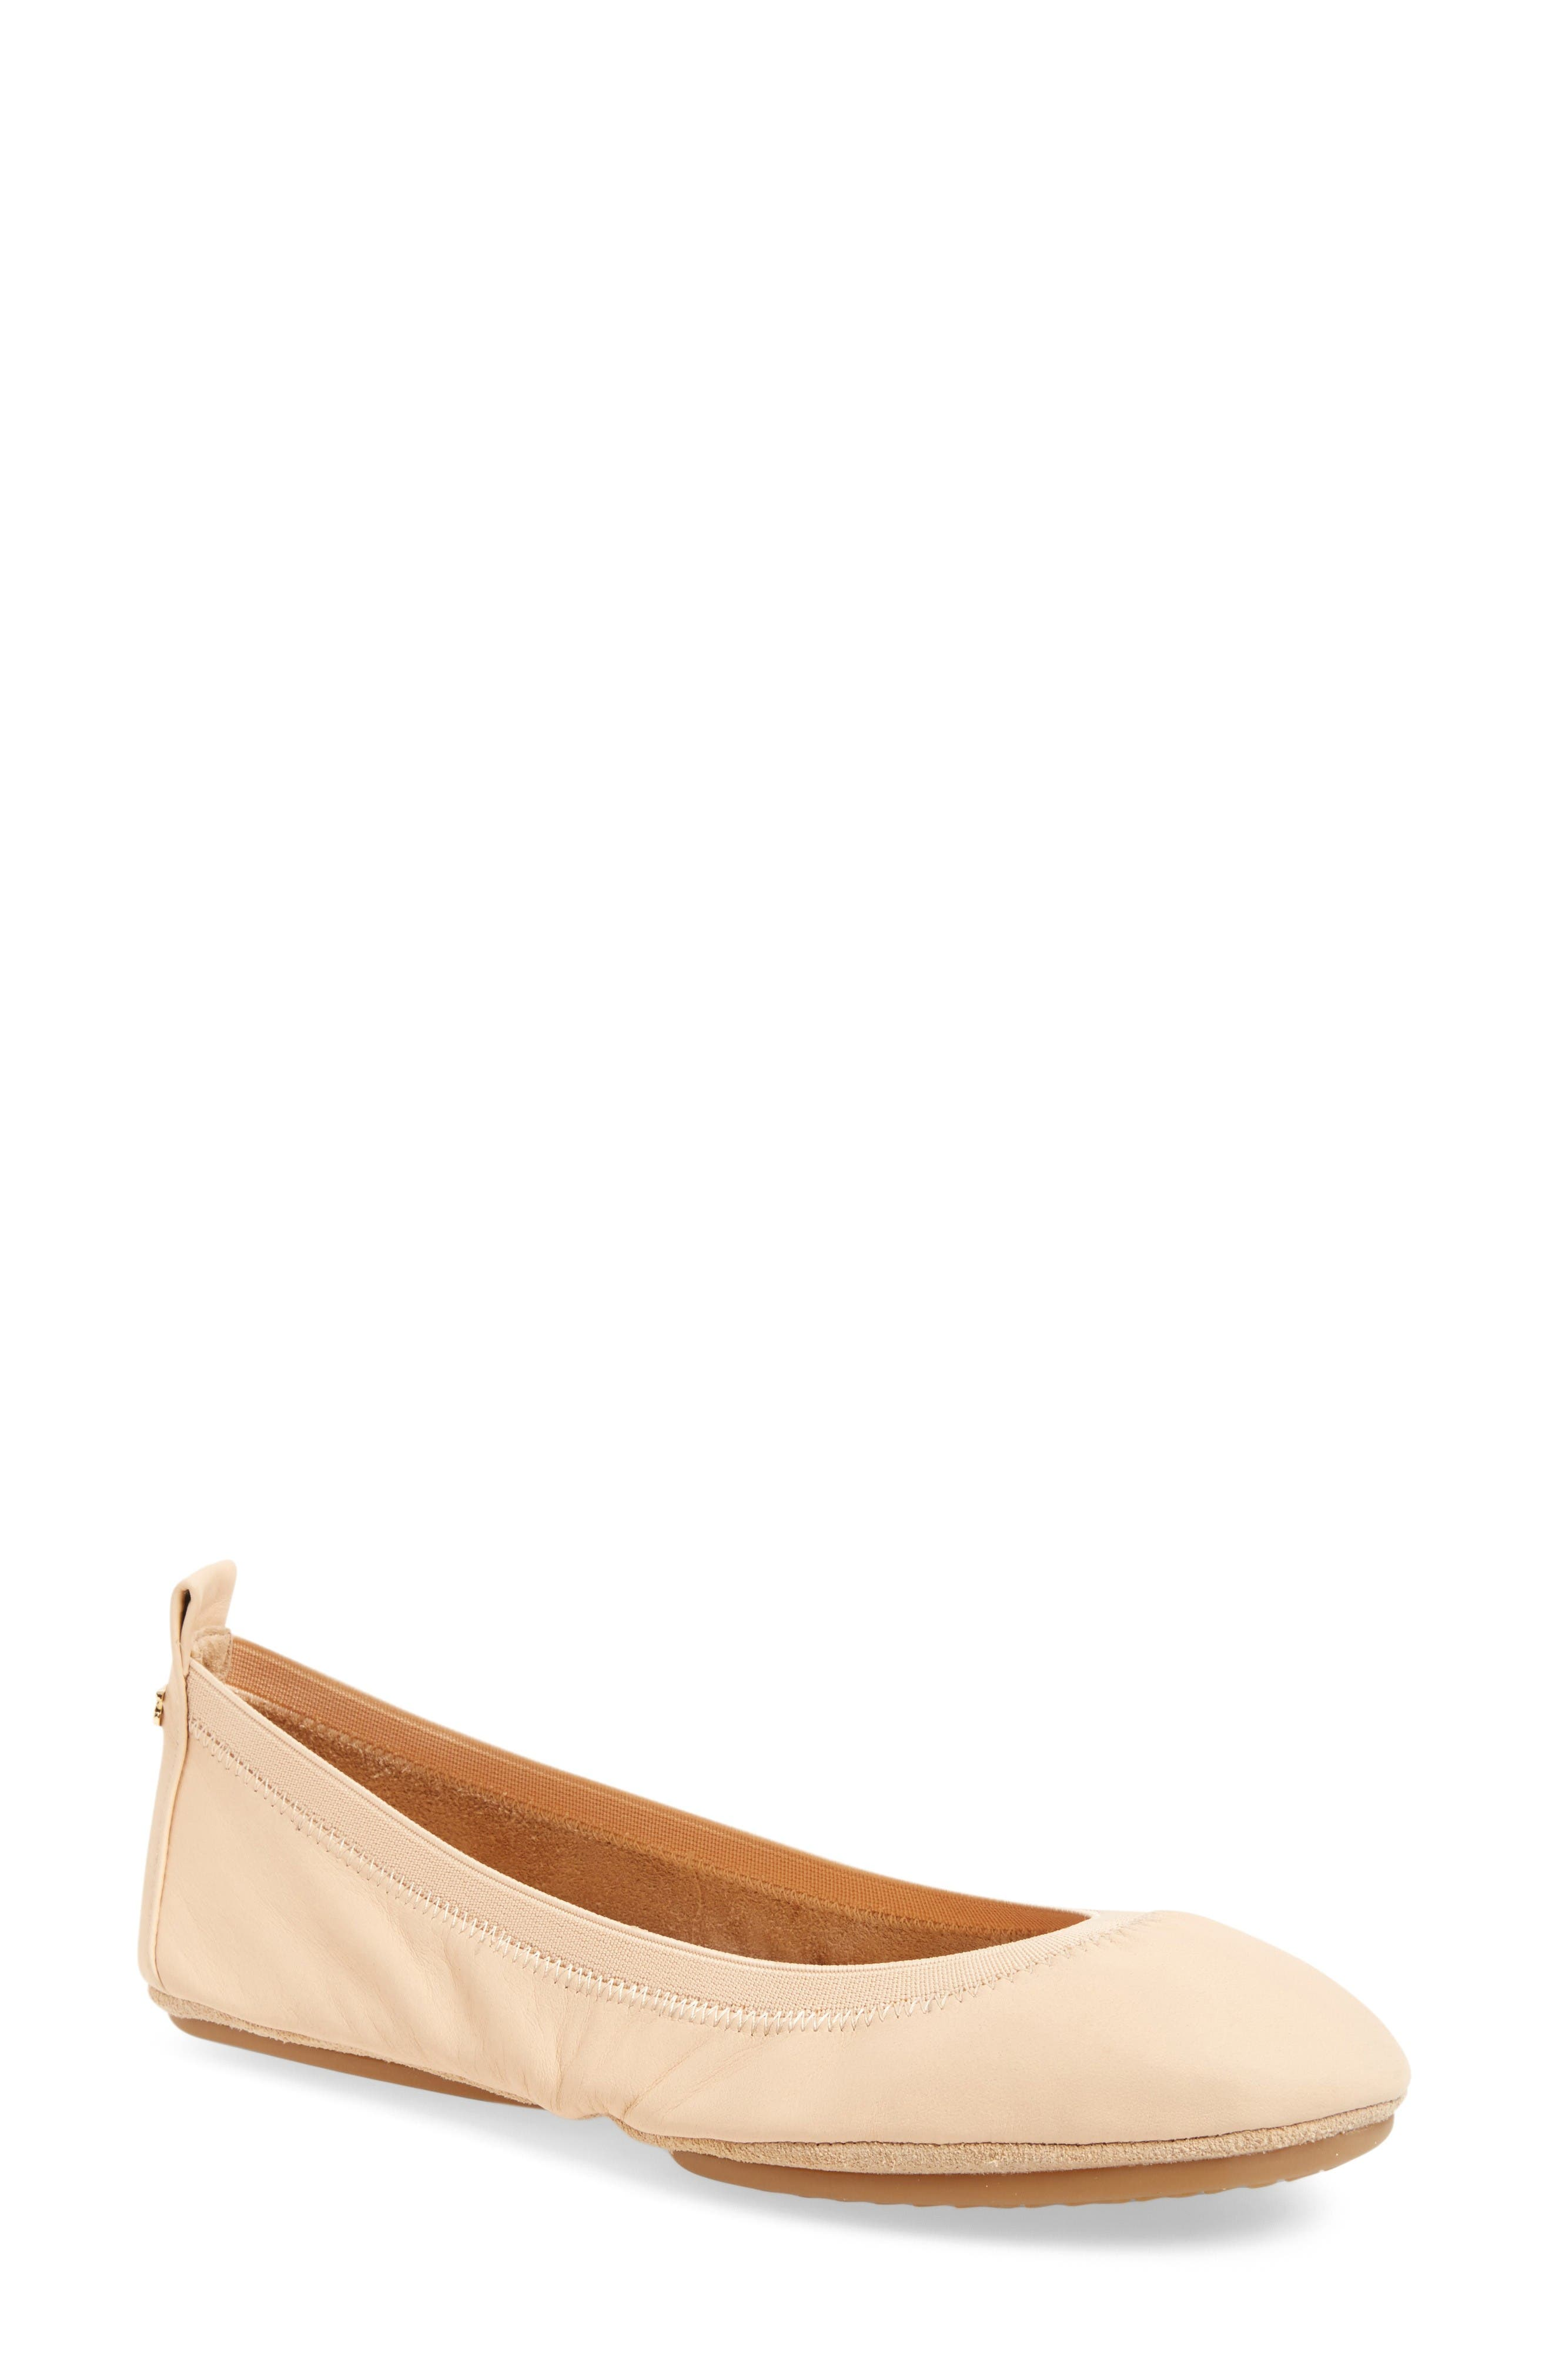 Samara Foldable Ballet Flat,                             Main thumbnail 1, color,                             Nude Leather